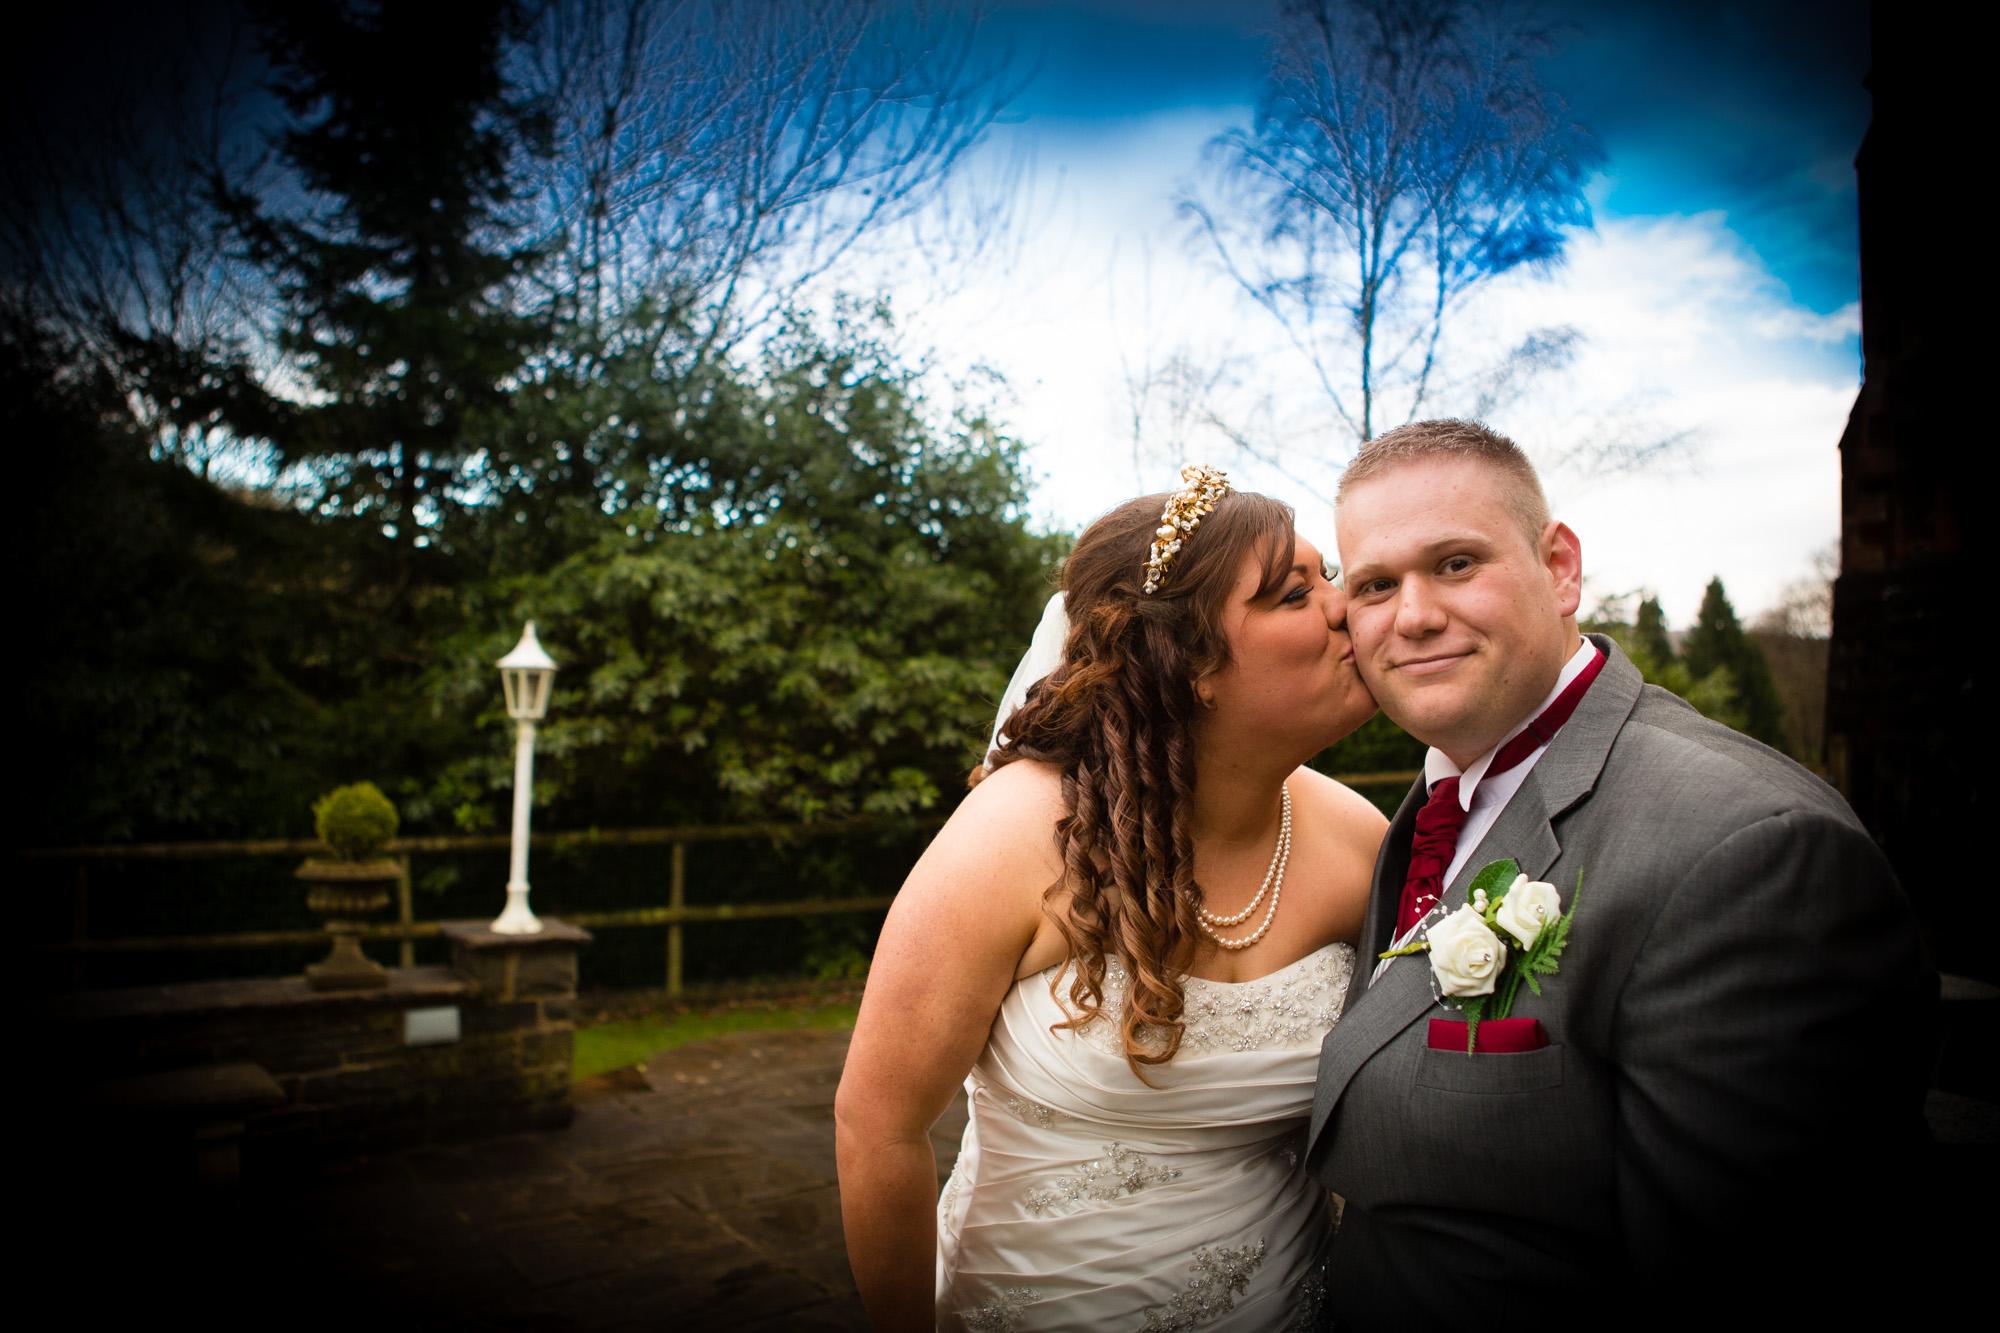 South Wales Wedding Photograher at Craig Y Nos Castle (23)